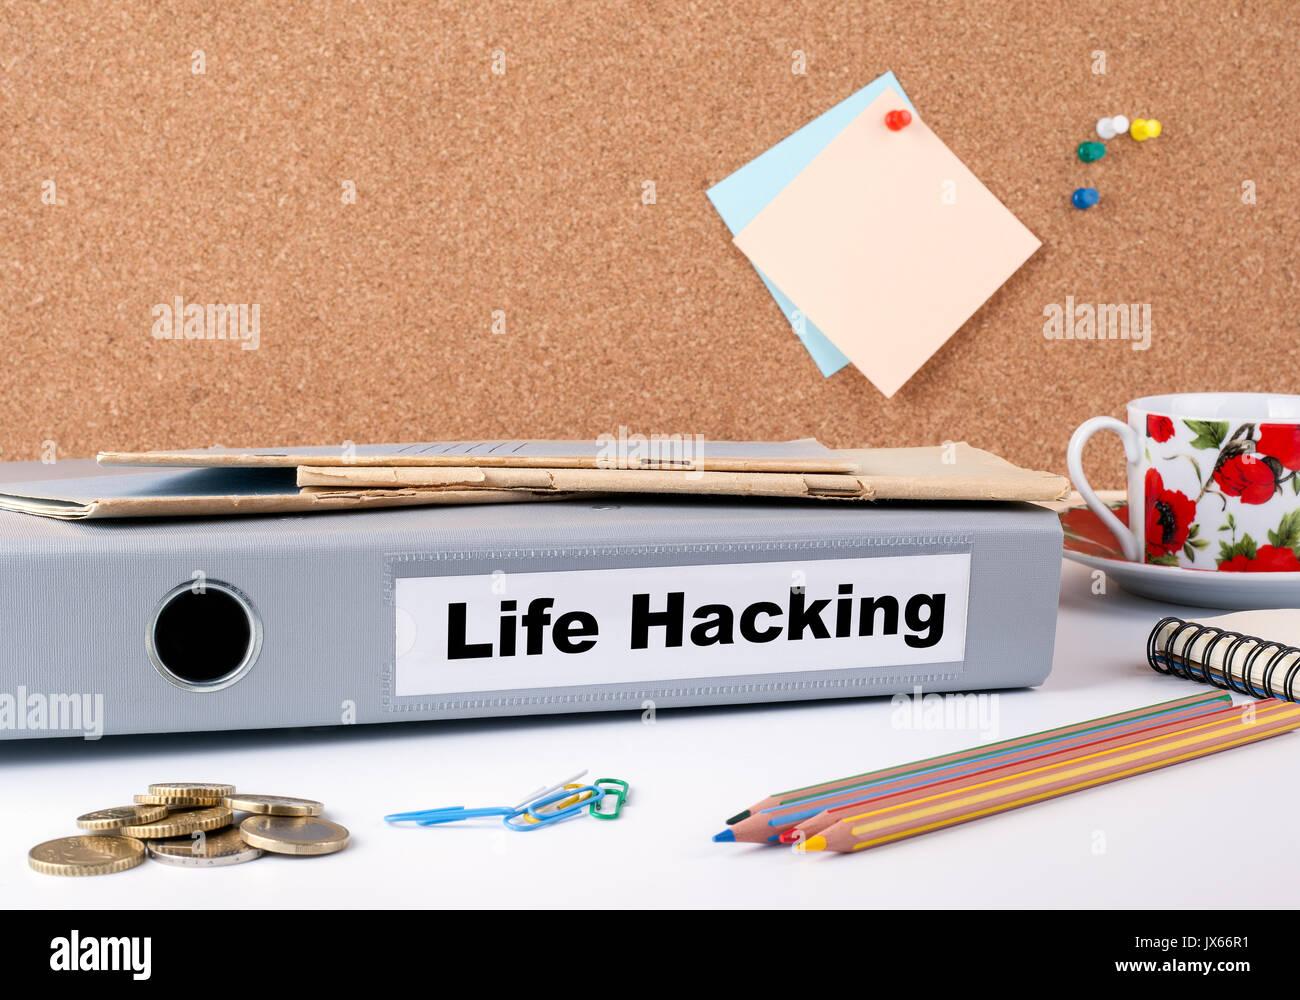 Life Hacking. Folder on office desk. Money, Coffee Mug and colored pencils. - Stock Image